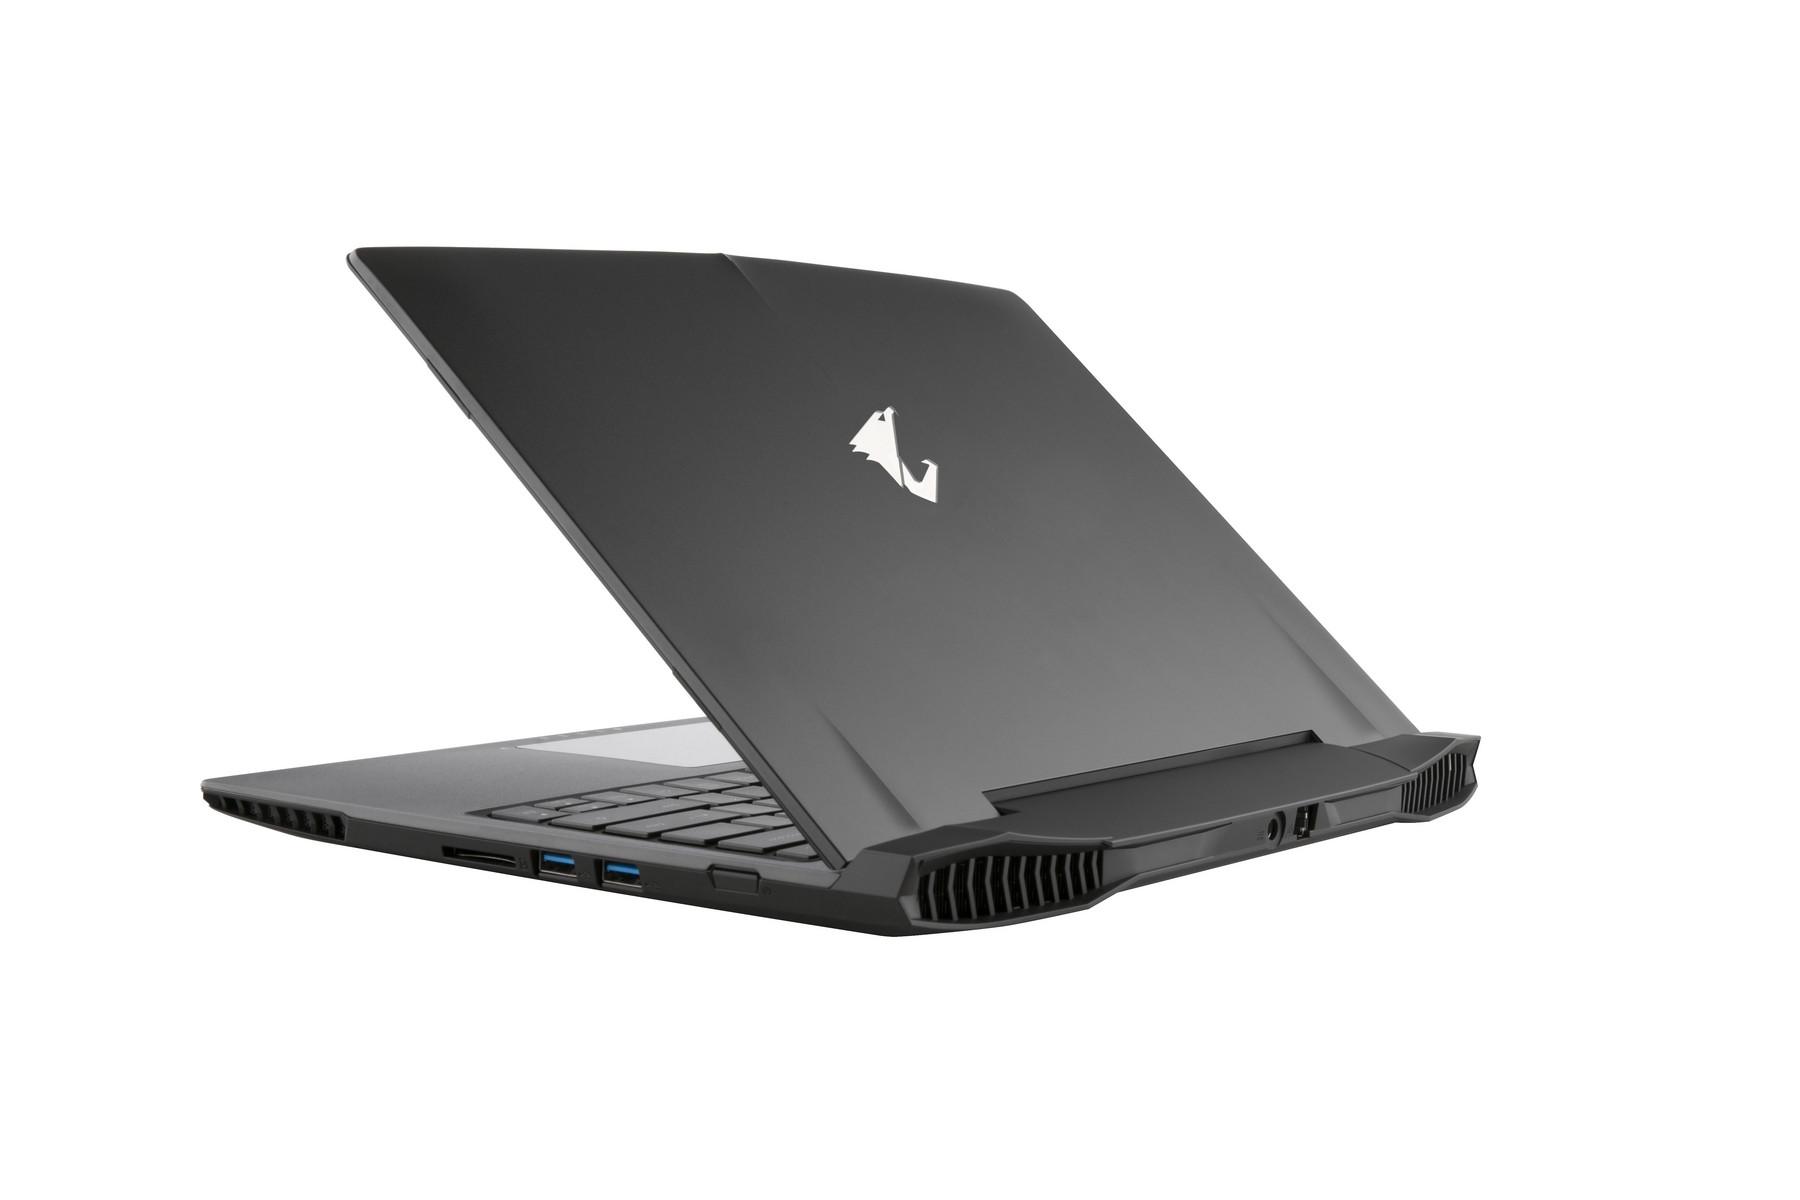 Gigabyte Aorus X3 Plus v3 Intel WLAN Driver for Mac Download